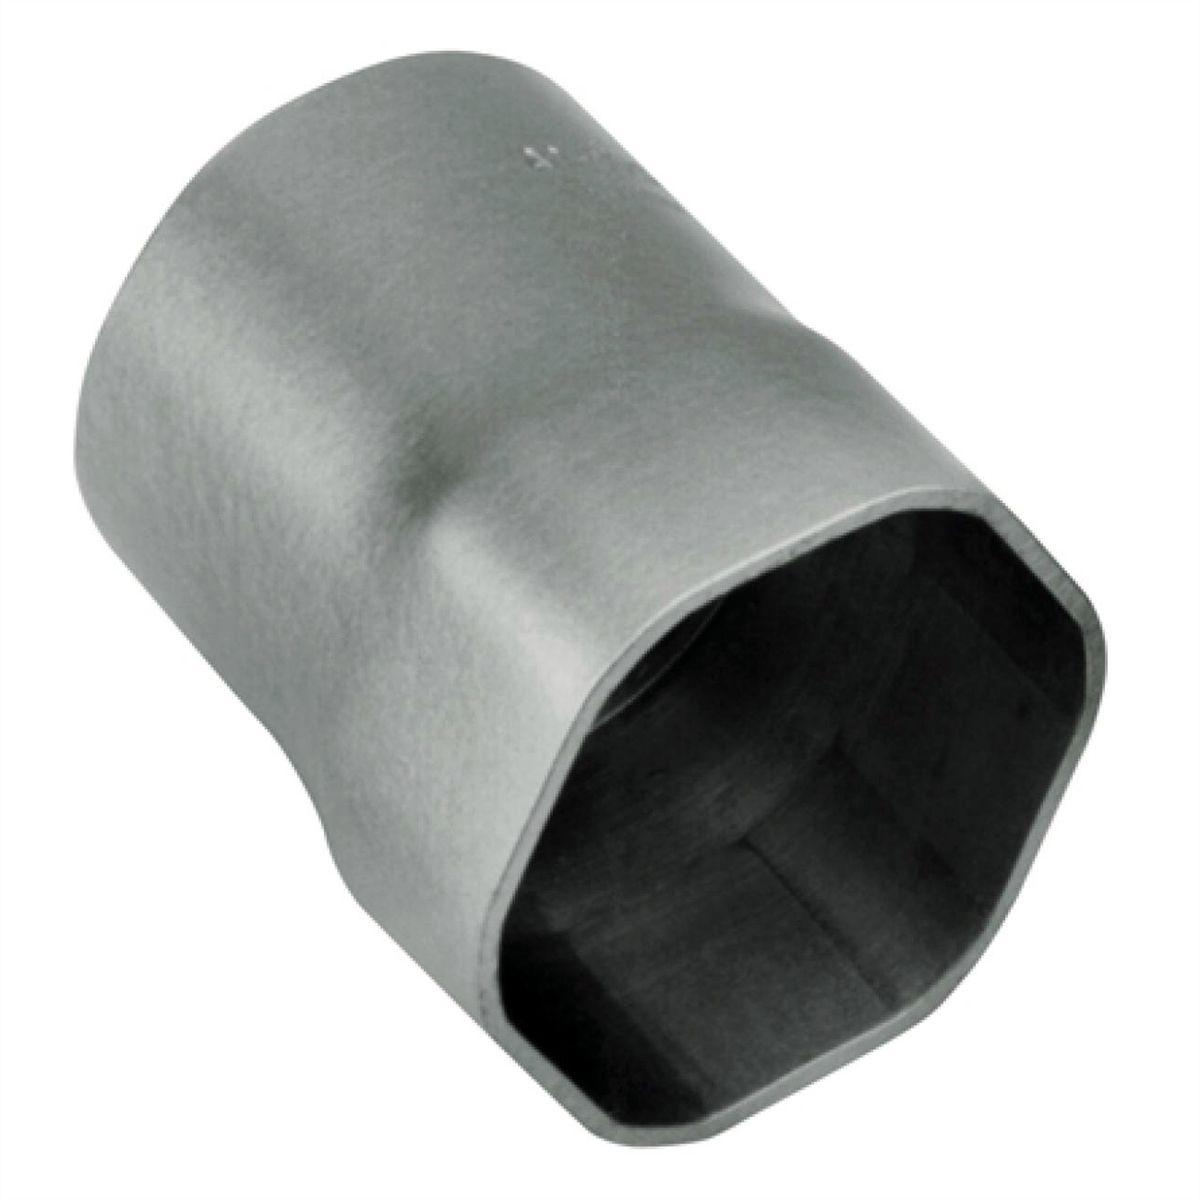 OTC 7157 Wrench Spanner Locknut